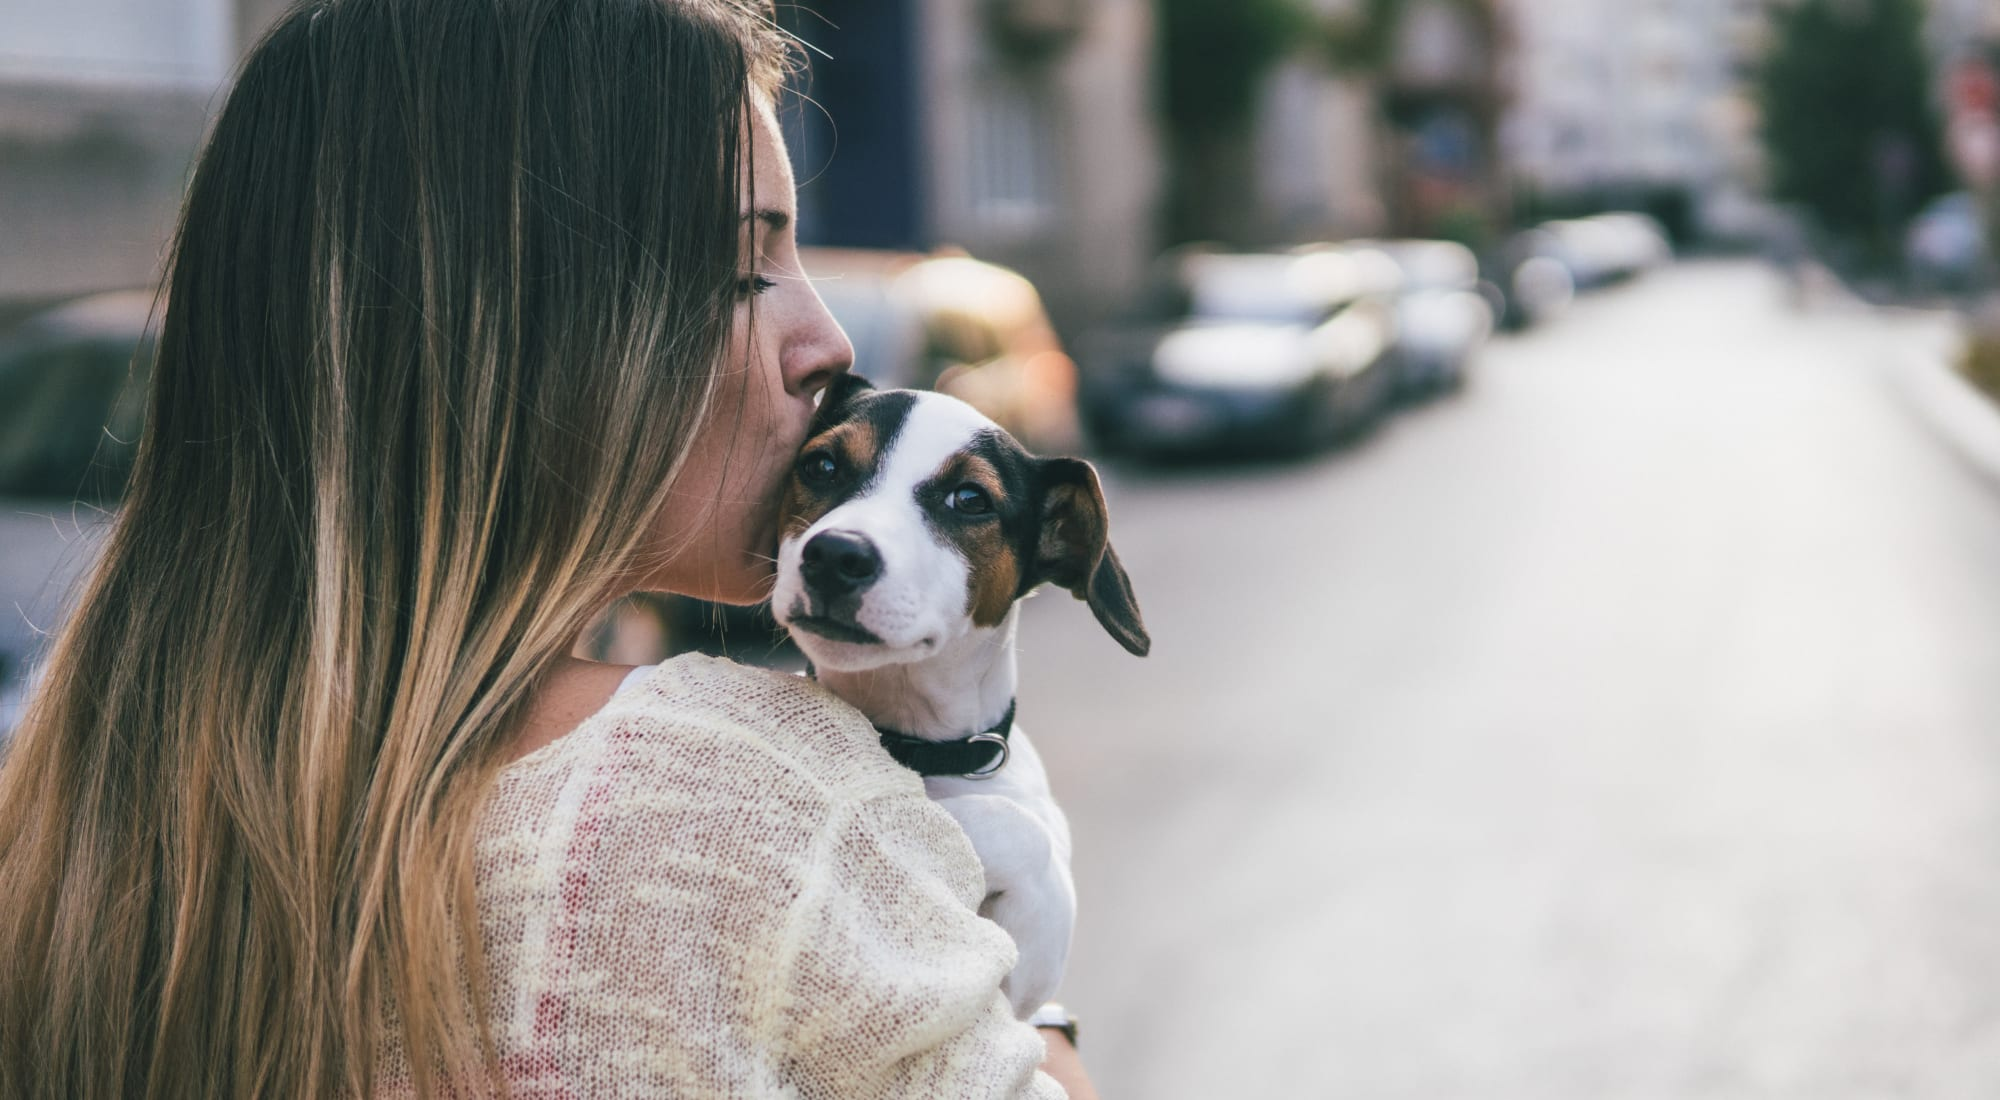 Pet-friendly apartments at Sofi Sunnyvale in Sunnyvale, California